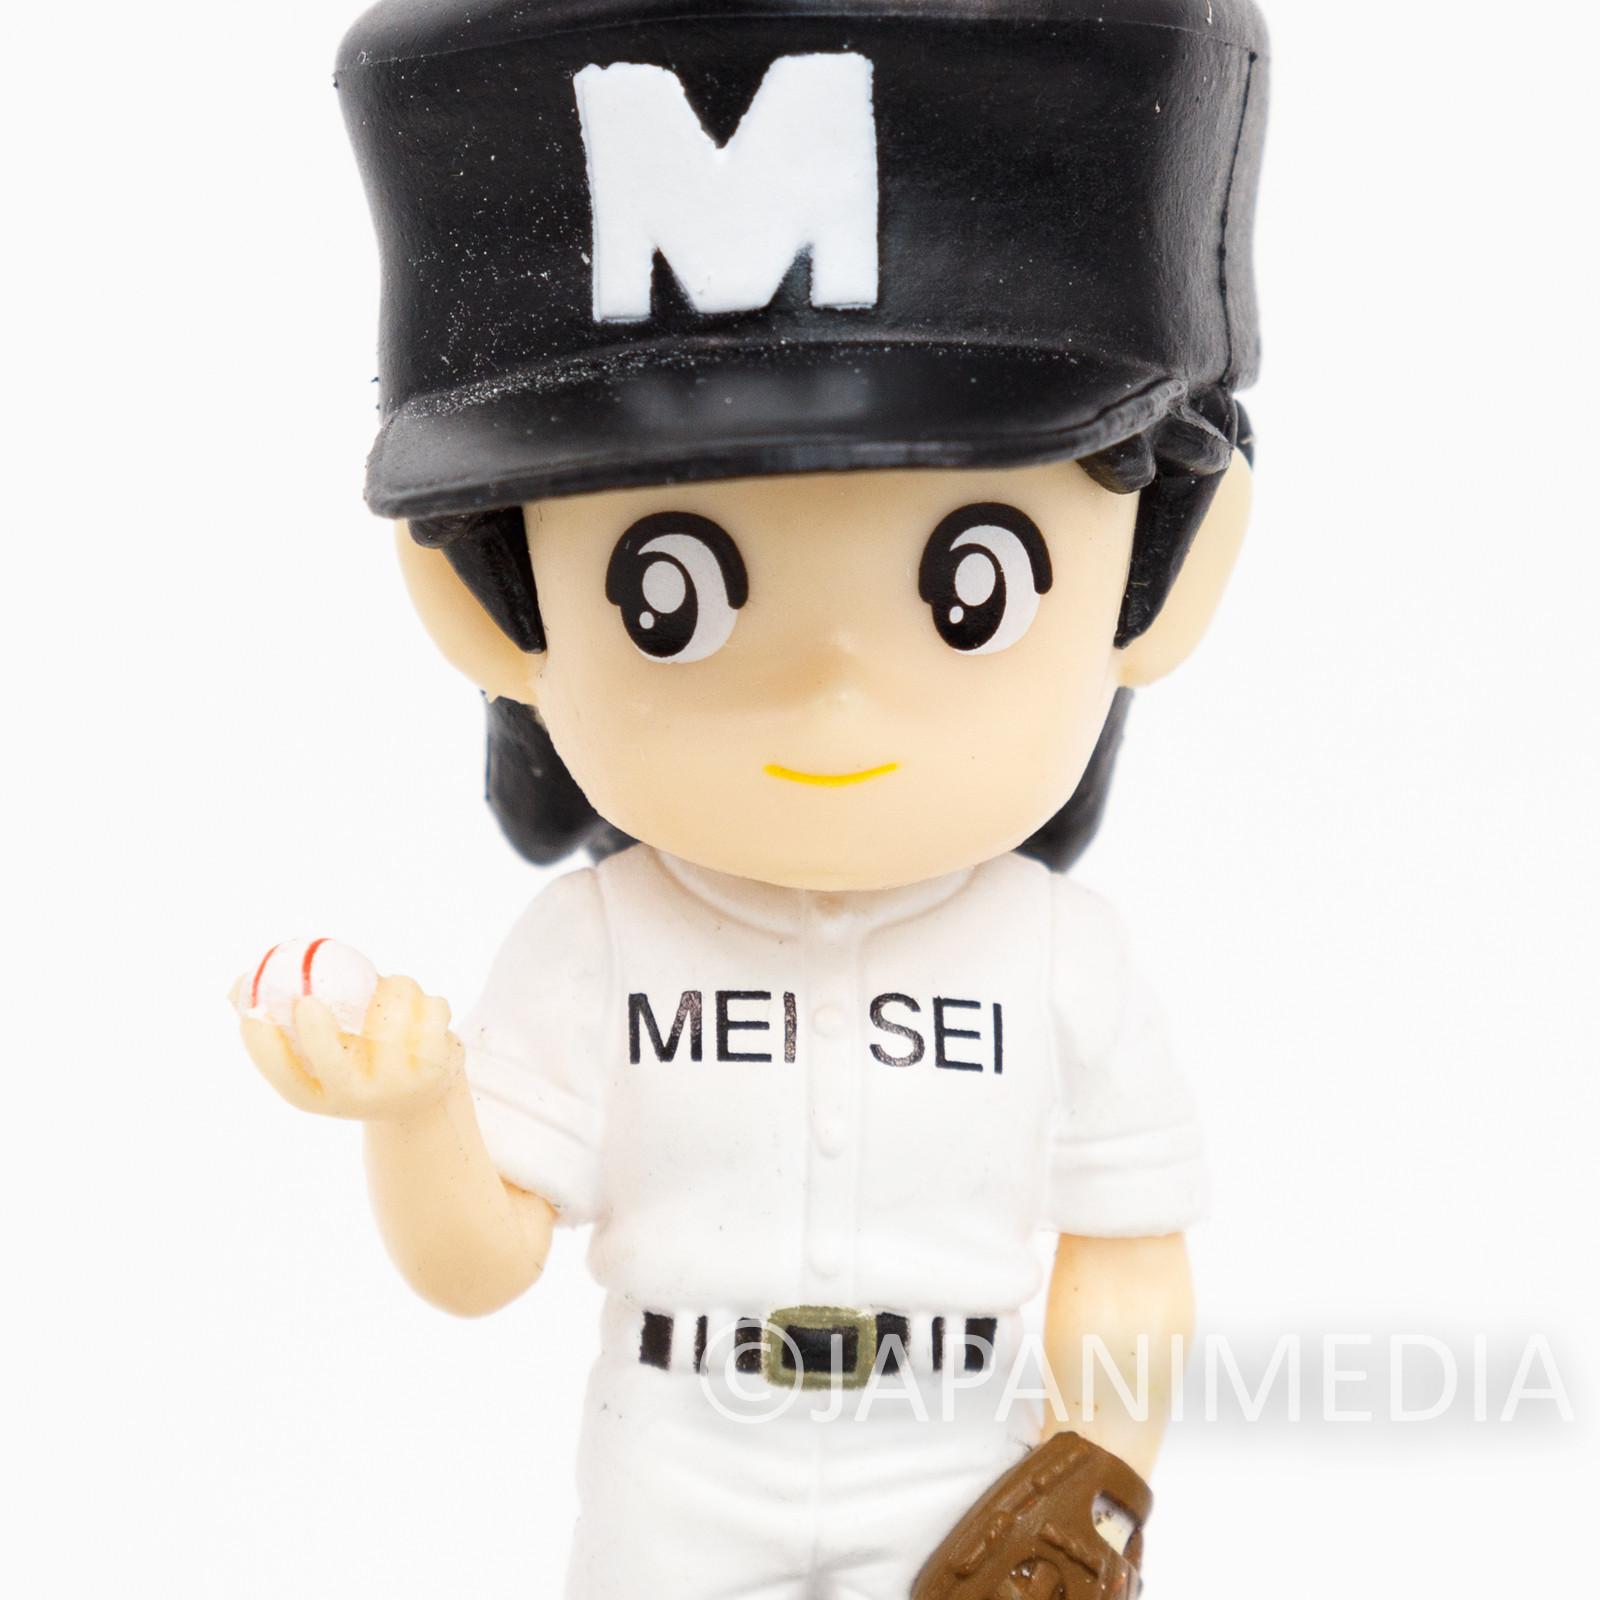 TOUCH Tatsuya Uesugi Bobbin Head Figure Mitsuru Adachi Toy Full JAPAN ANIME MANGA